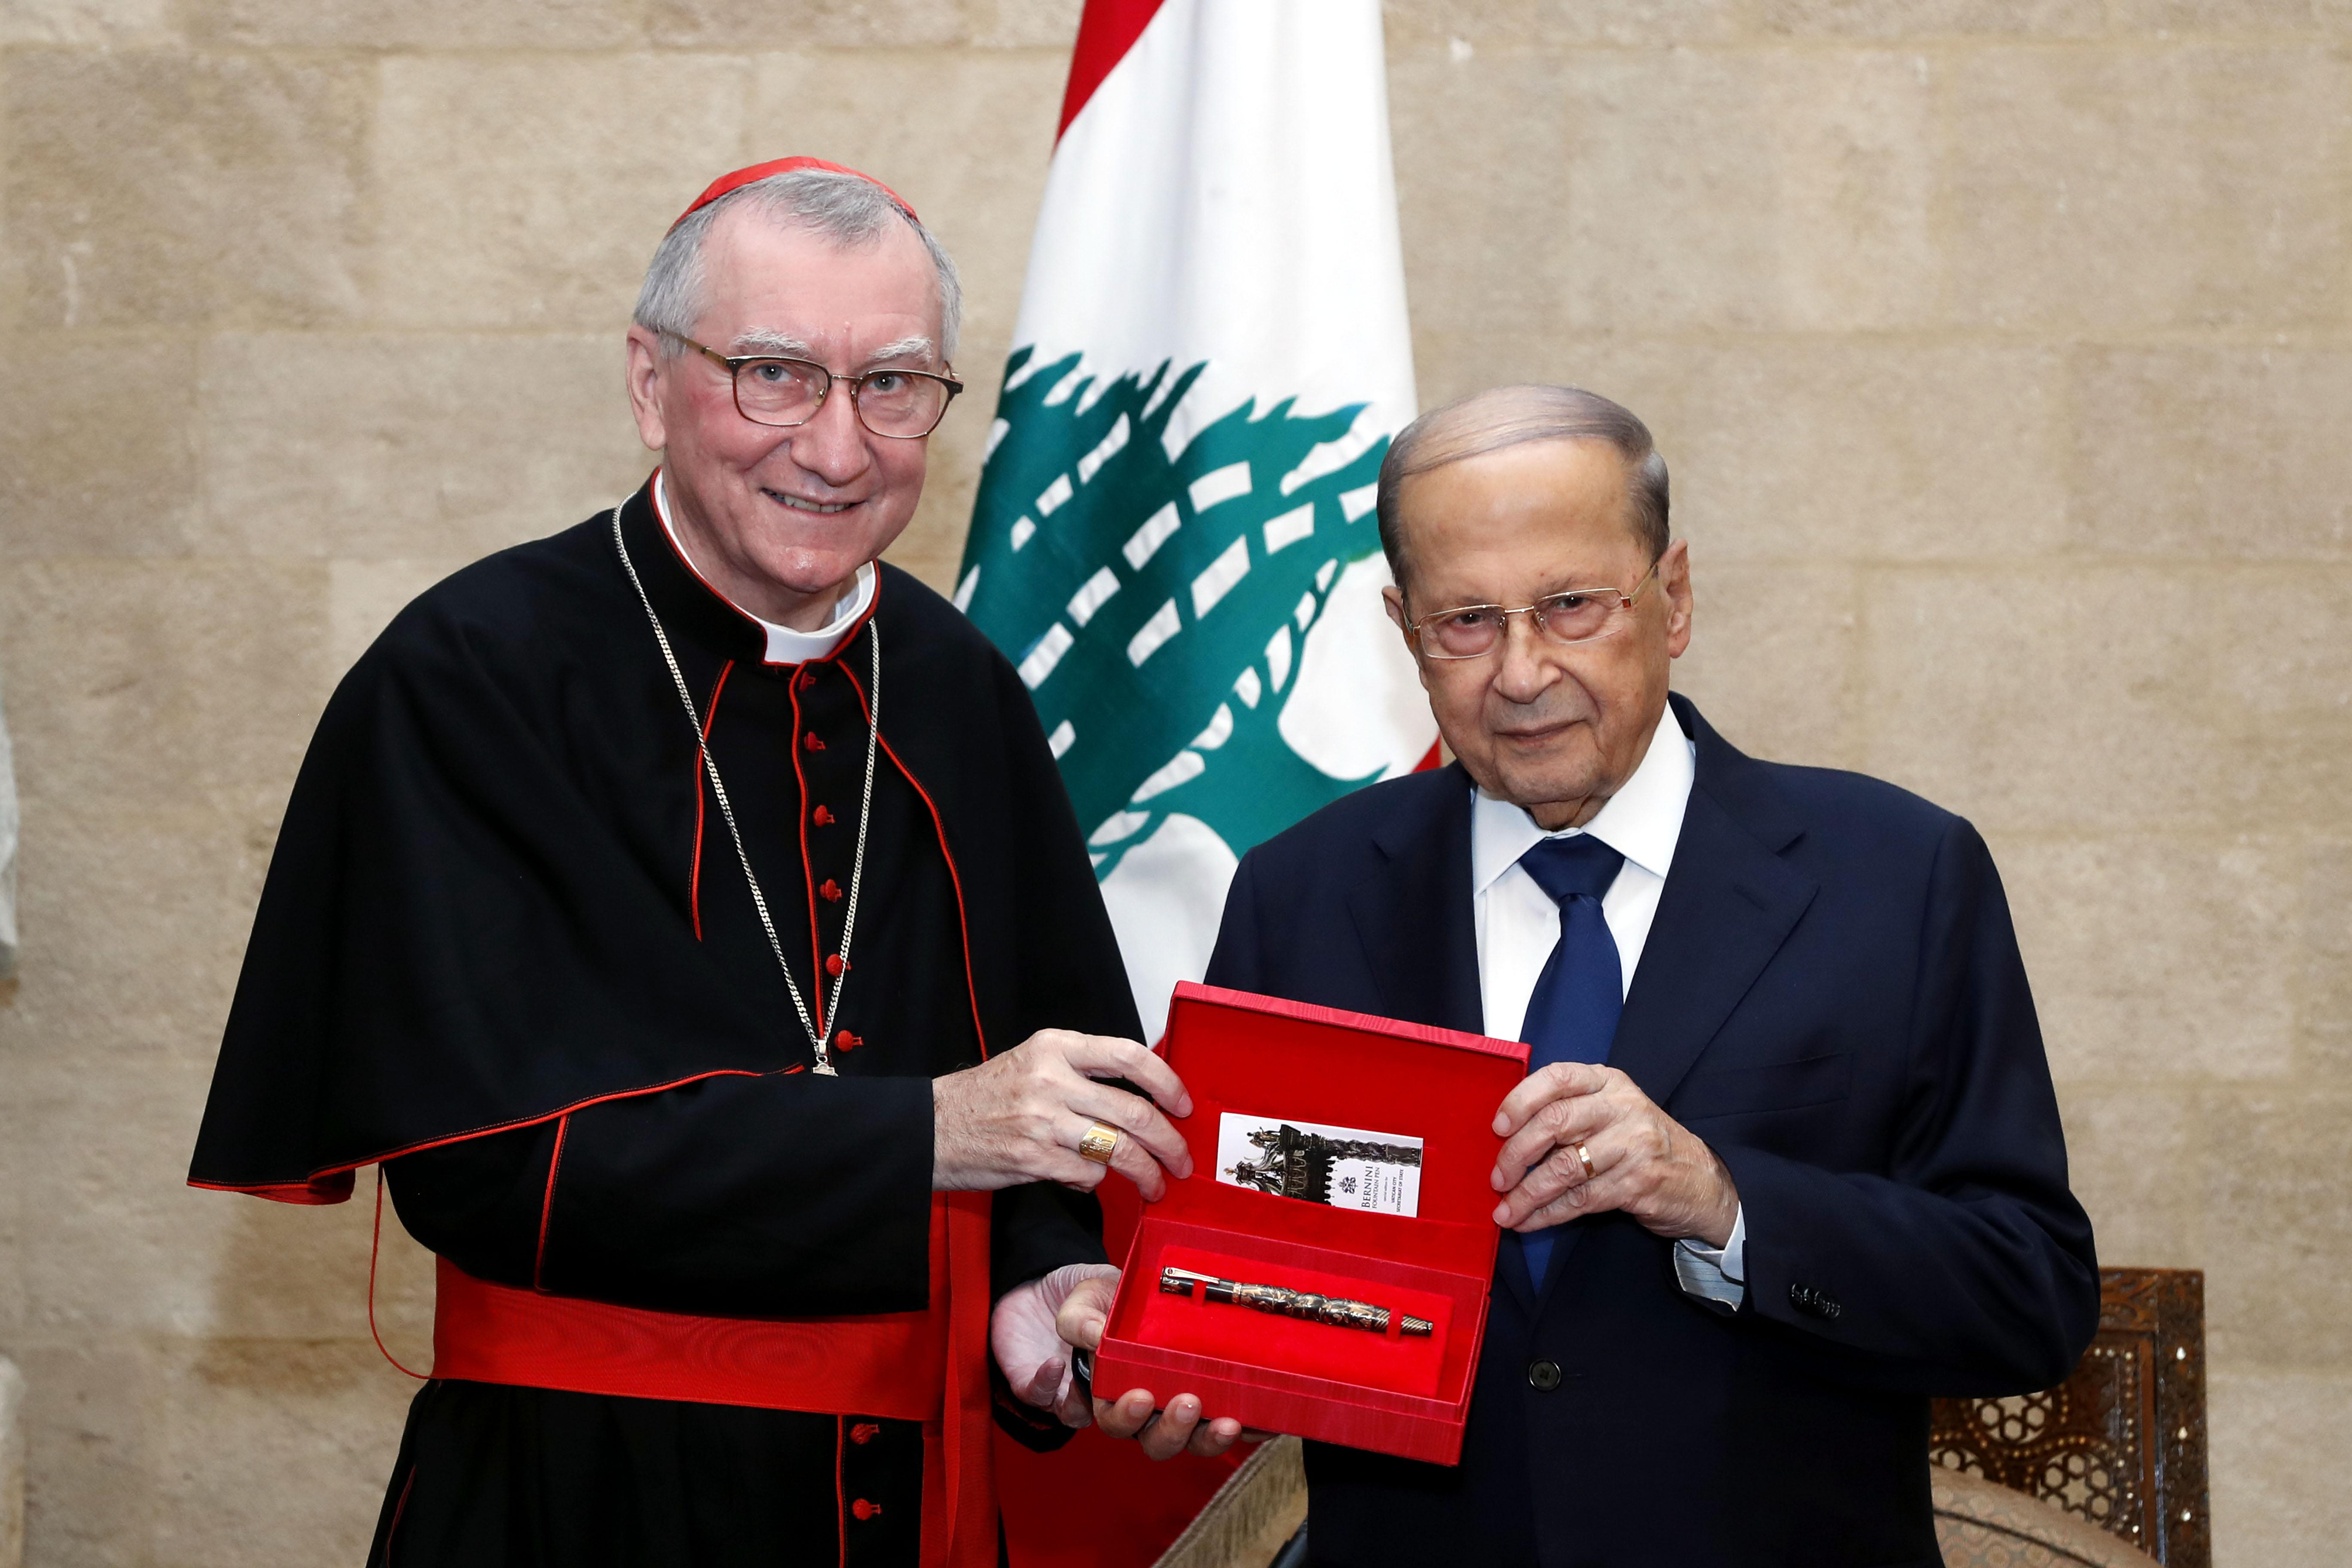 1 -S. Eminence Cardinal Pietro Parolin 03